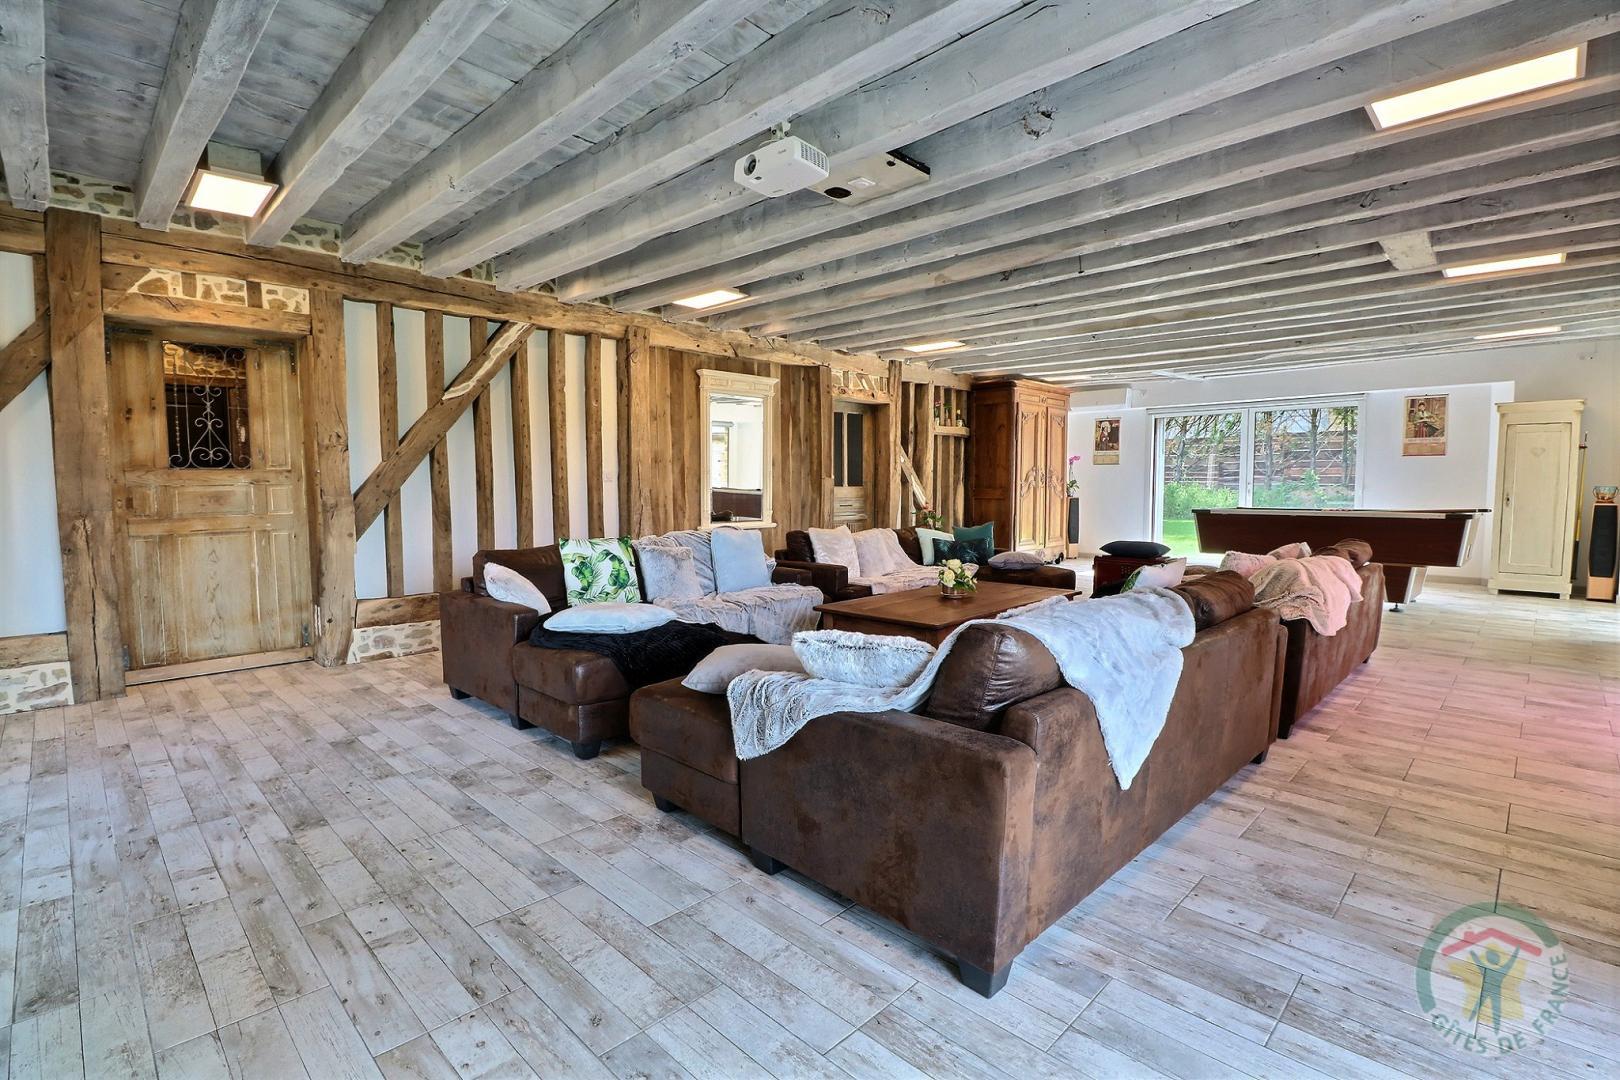 Gîte au bois charmant (salon)